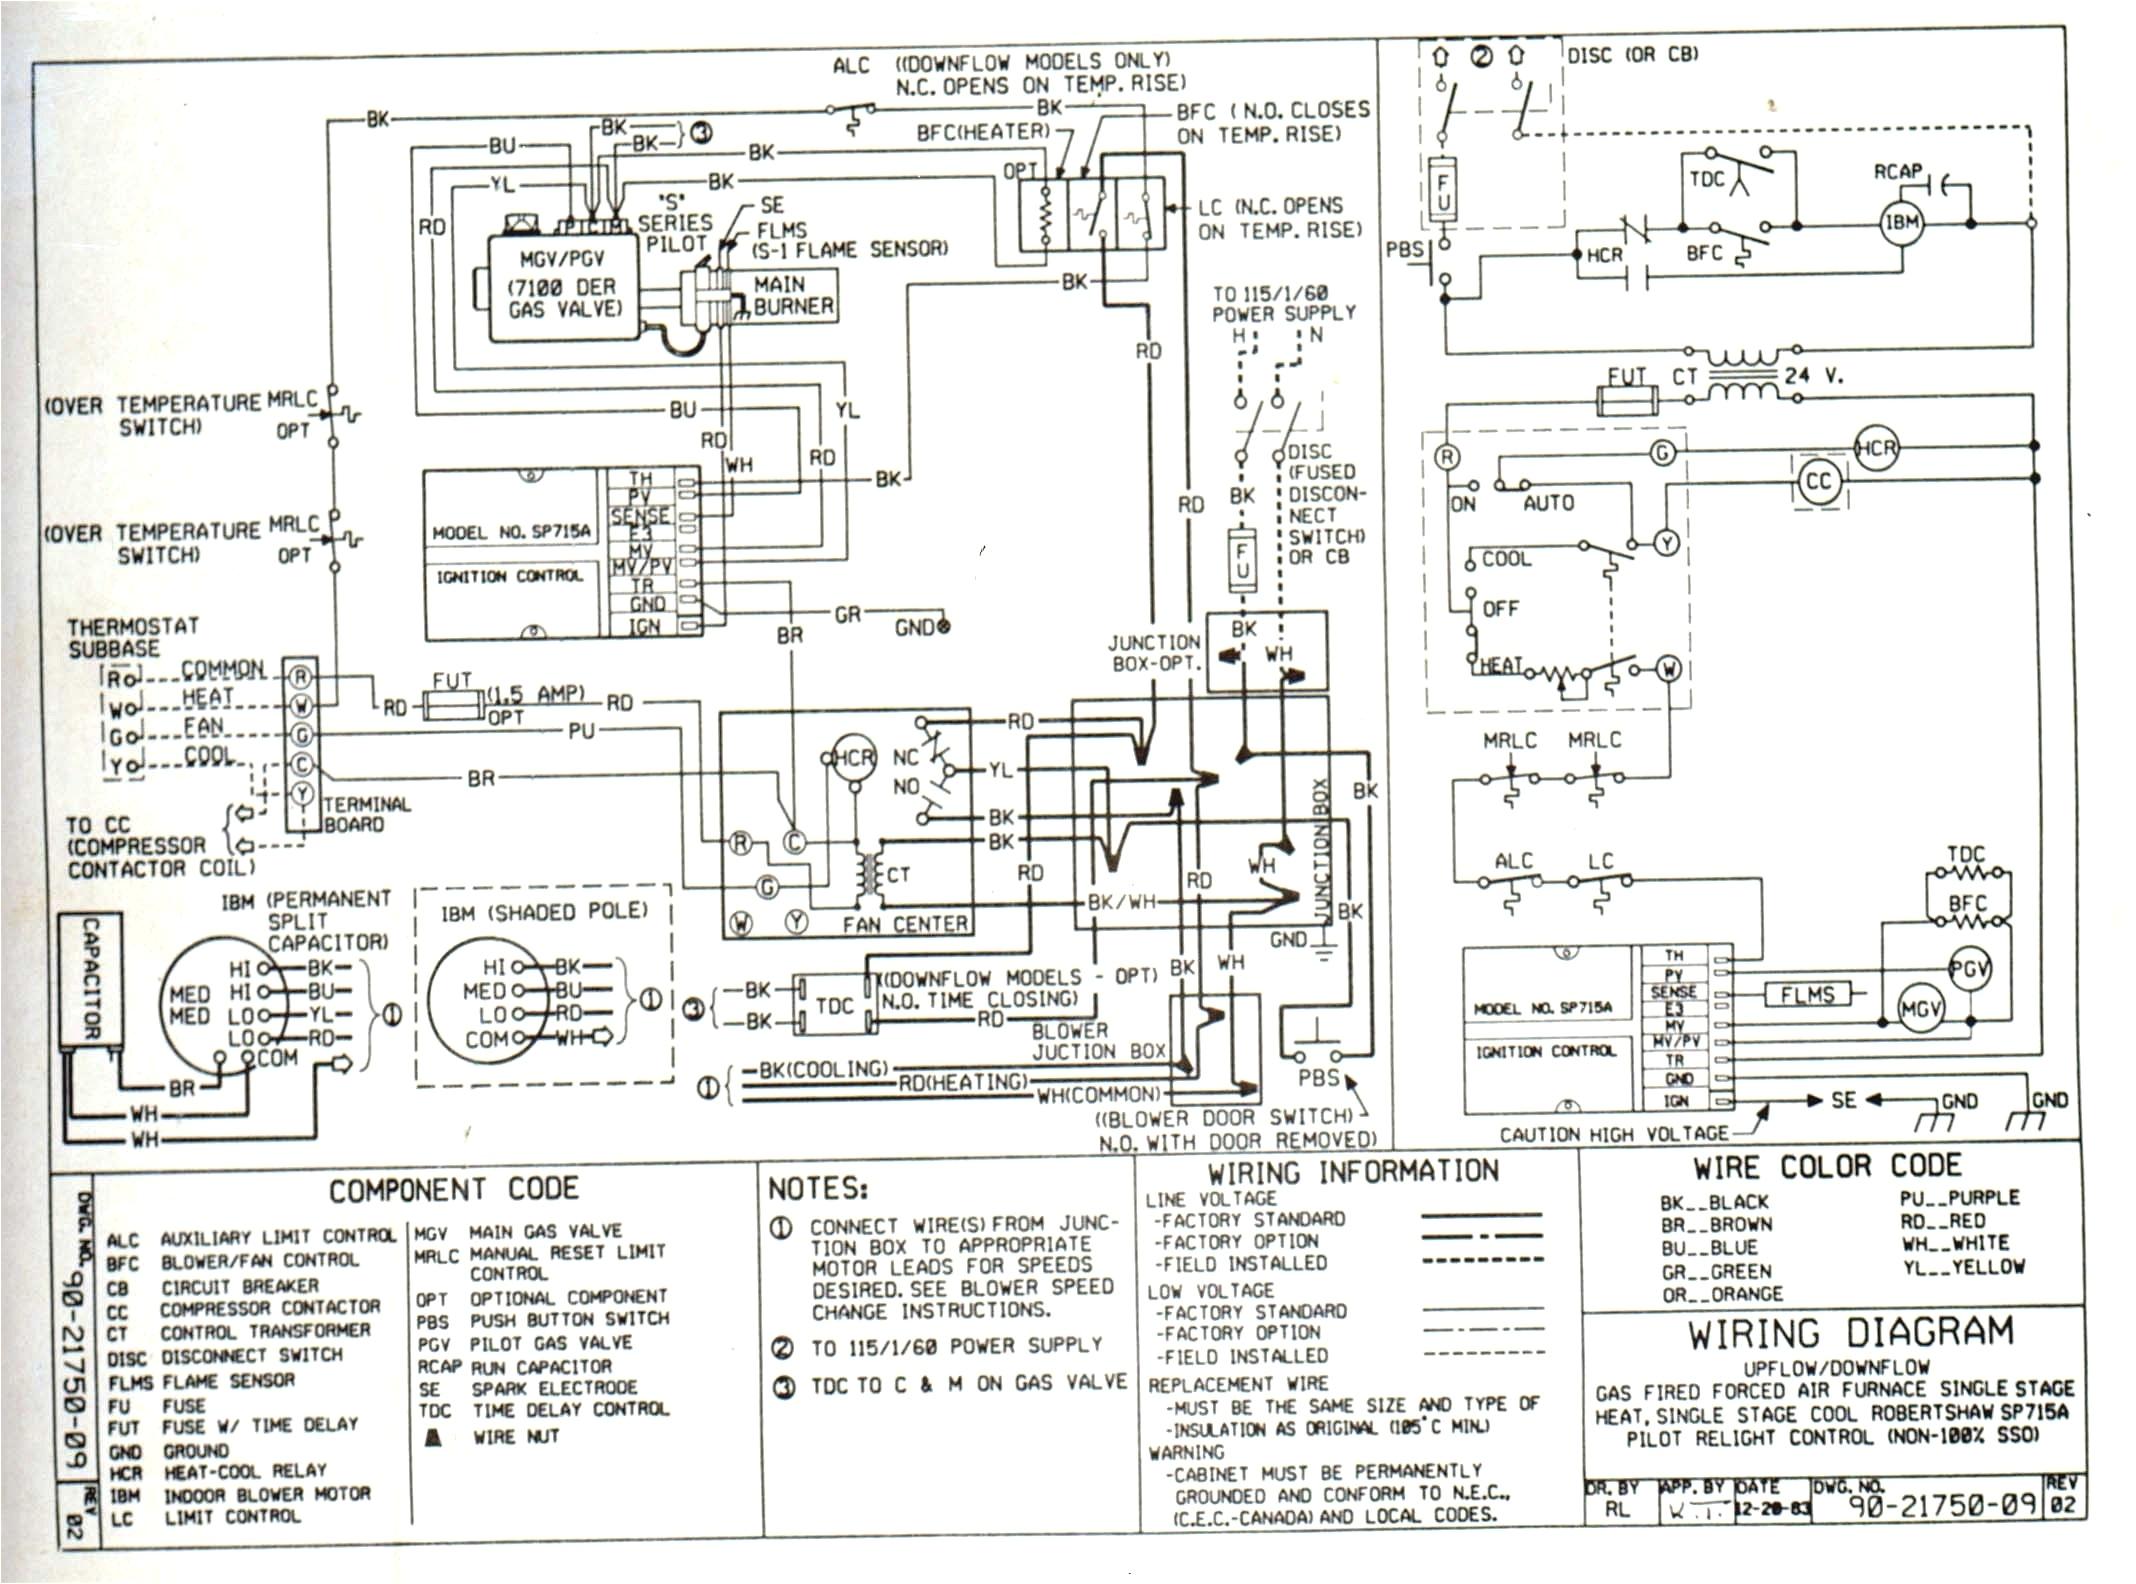 Trane Weathertron Heat Pump thermostat Wiring Diagram Heat Pump thermostat Wiring Wiring Diagram Database